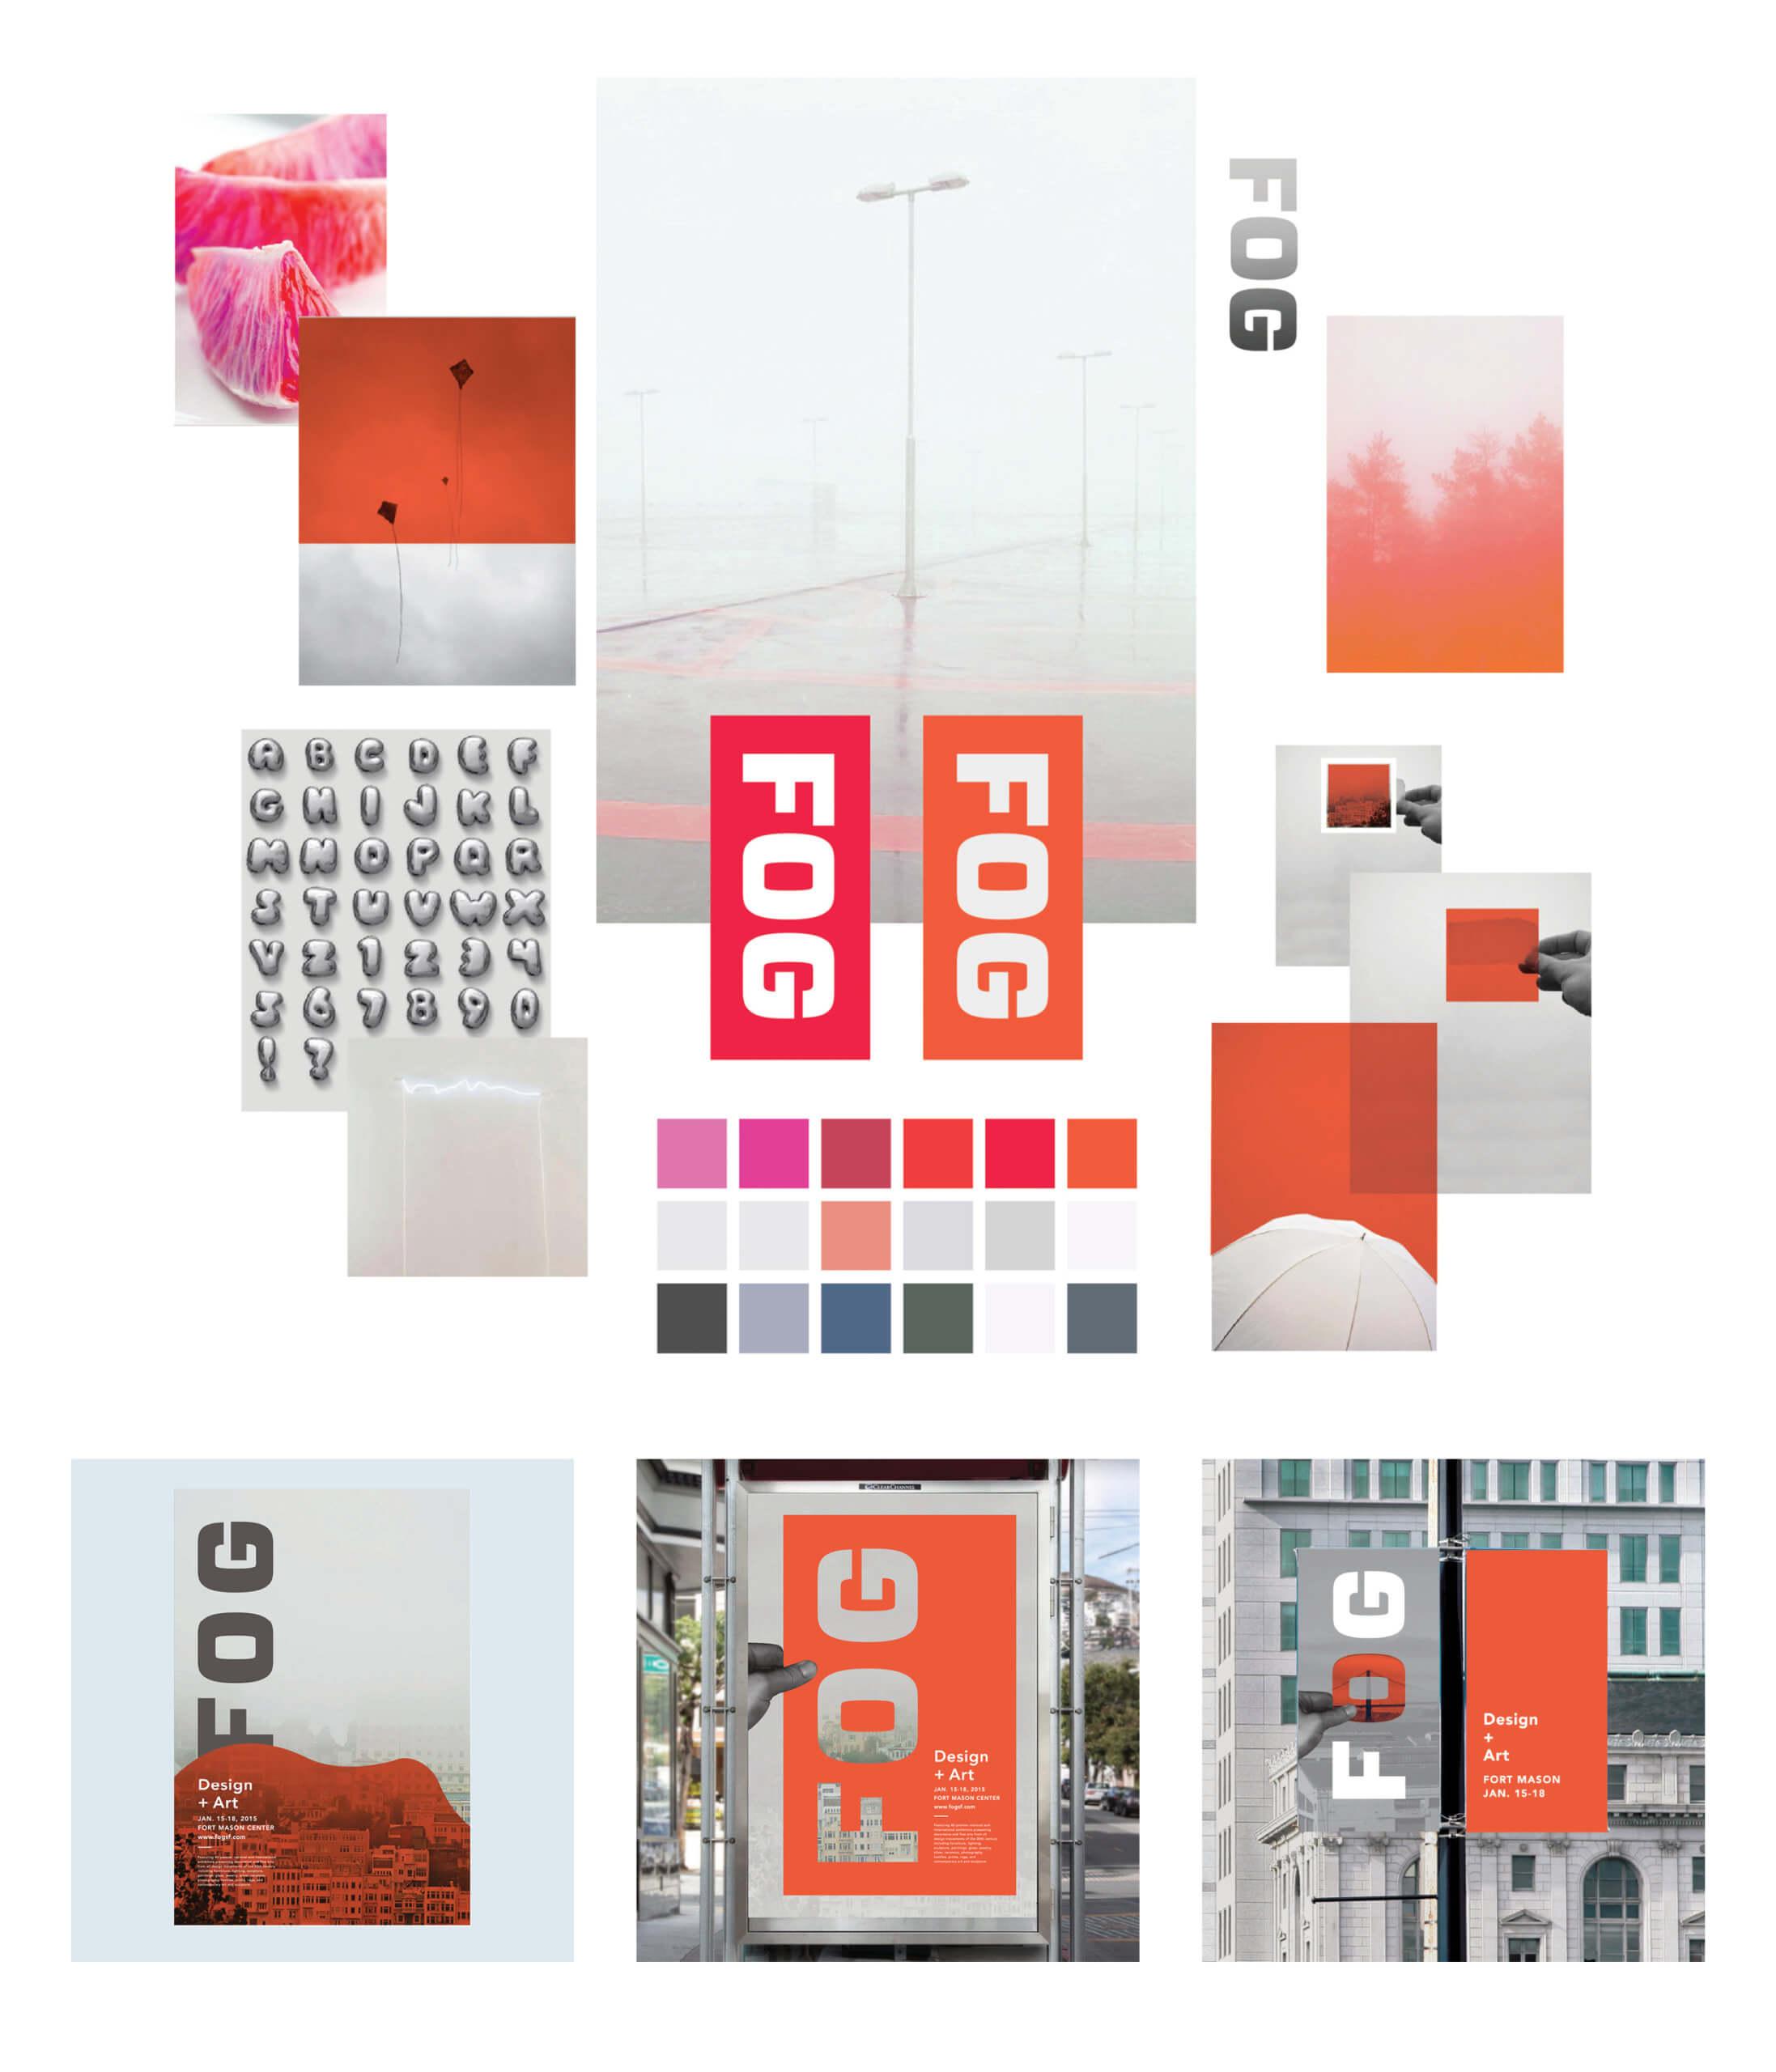 For Art + Design mood board 1